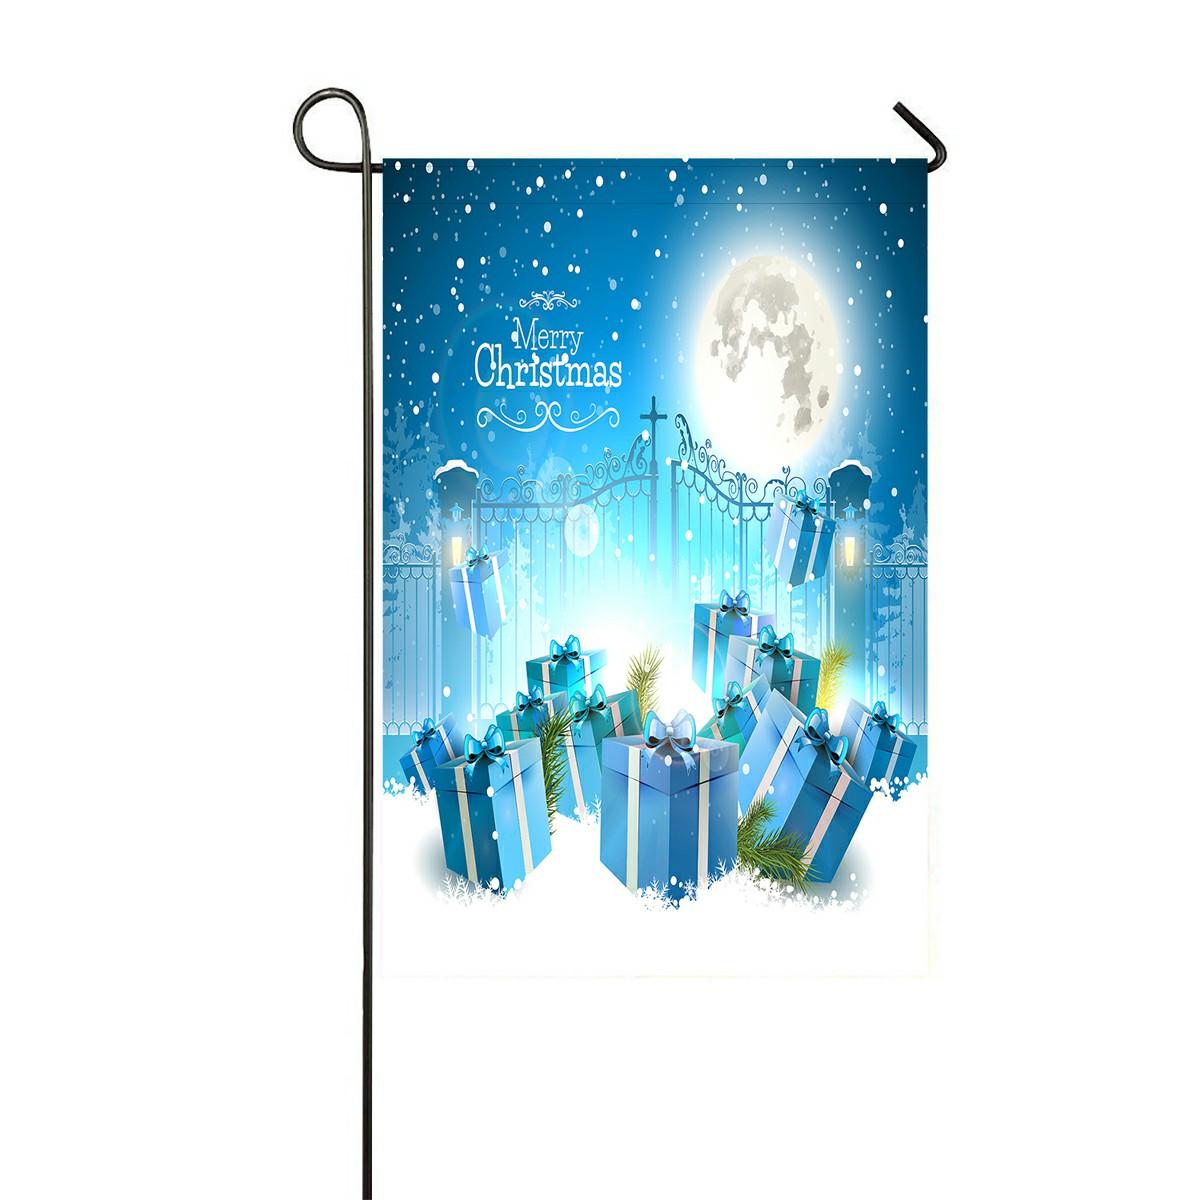 Eczjnt Christmas Gifts Snow Open Gate Outdoor Flag Home Party Garden Decor 12x18 Inch Walmart Com Walmart Com